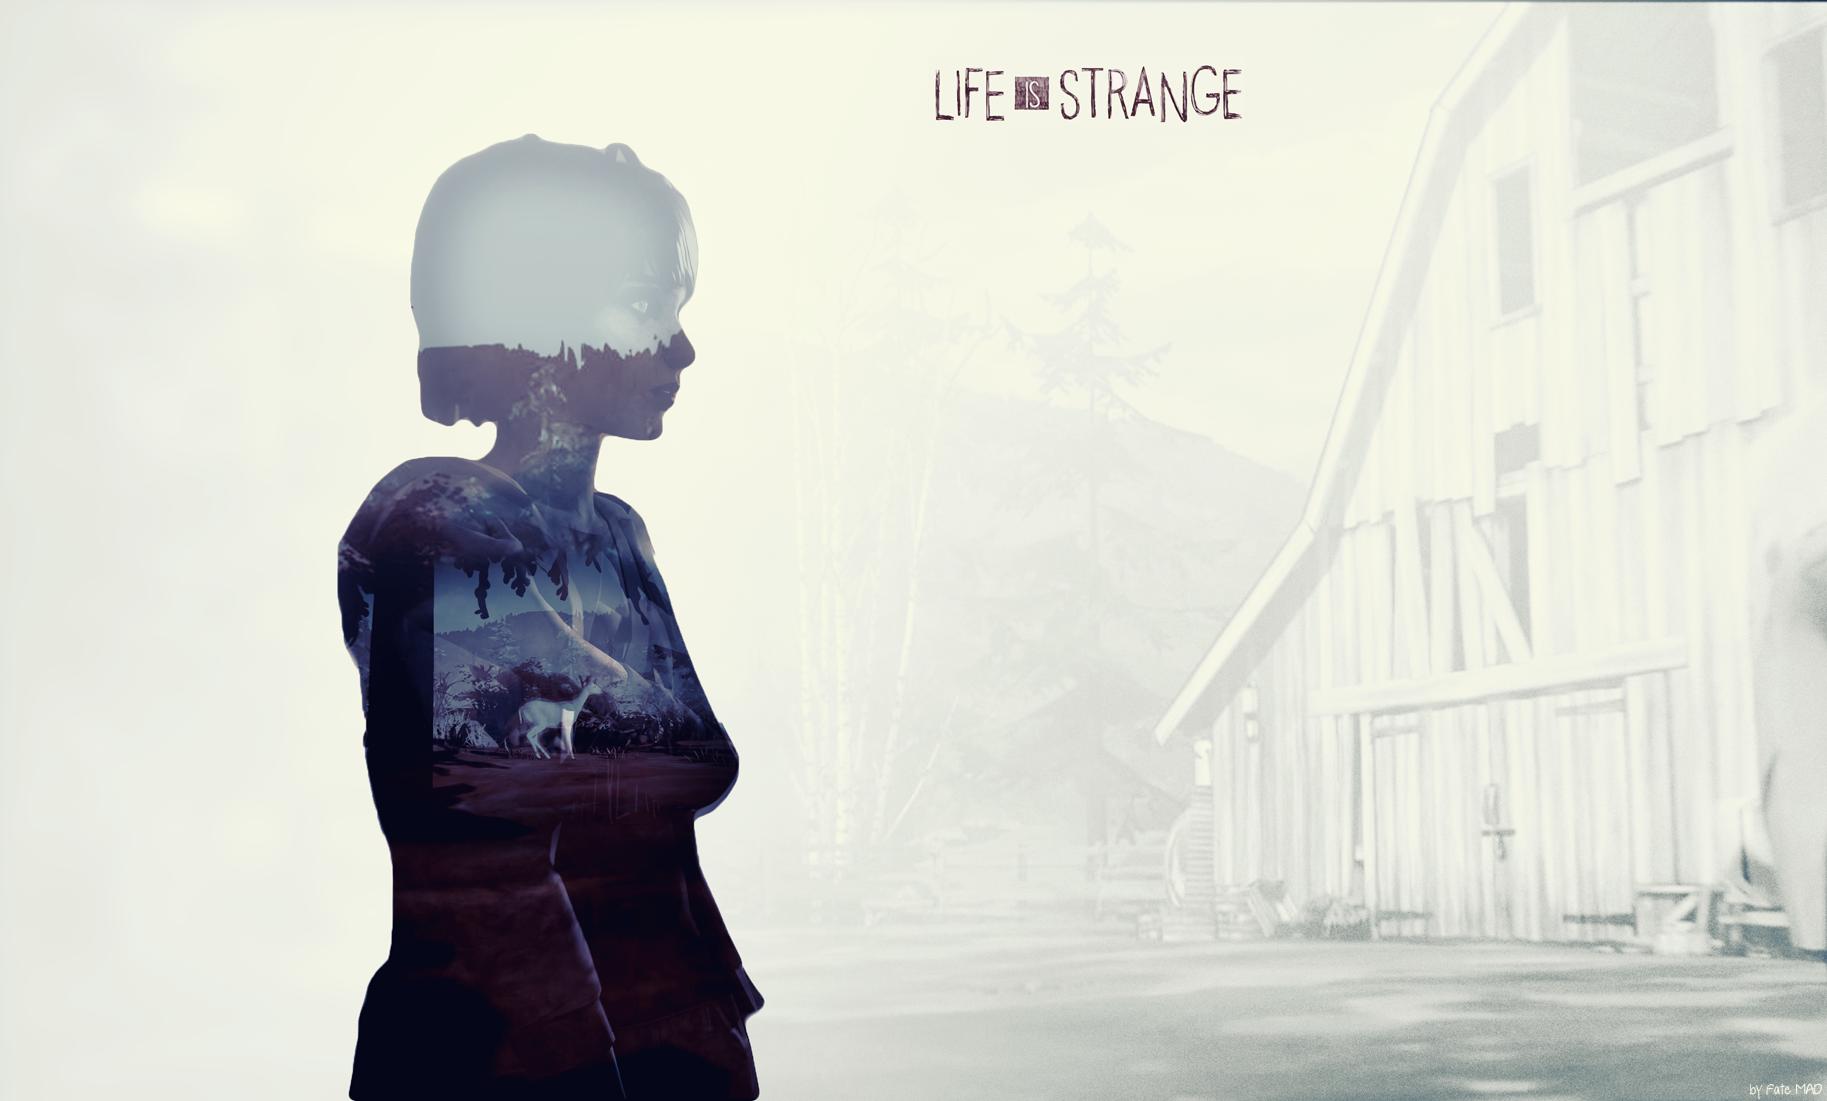 Life is strange. Max by NickKarlow on DeviantArt